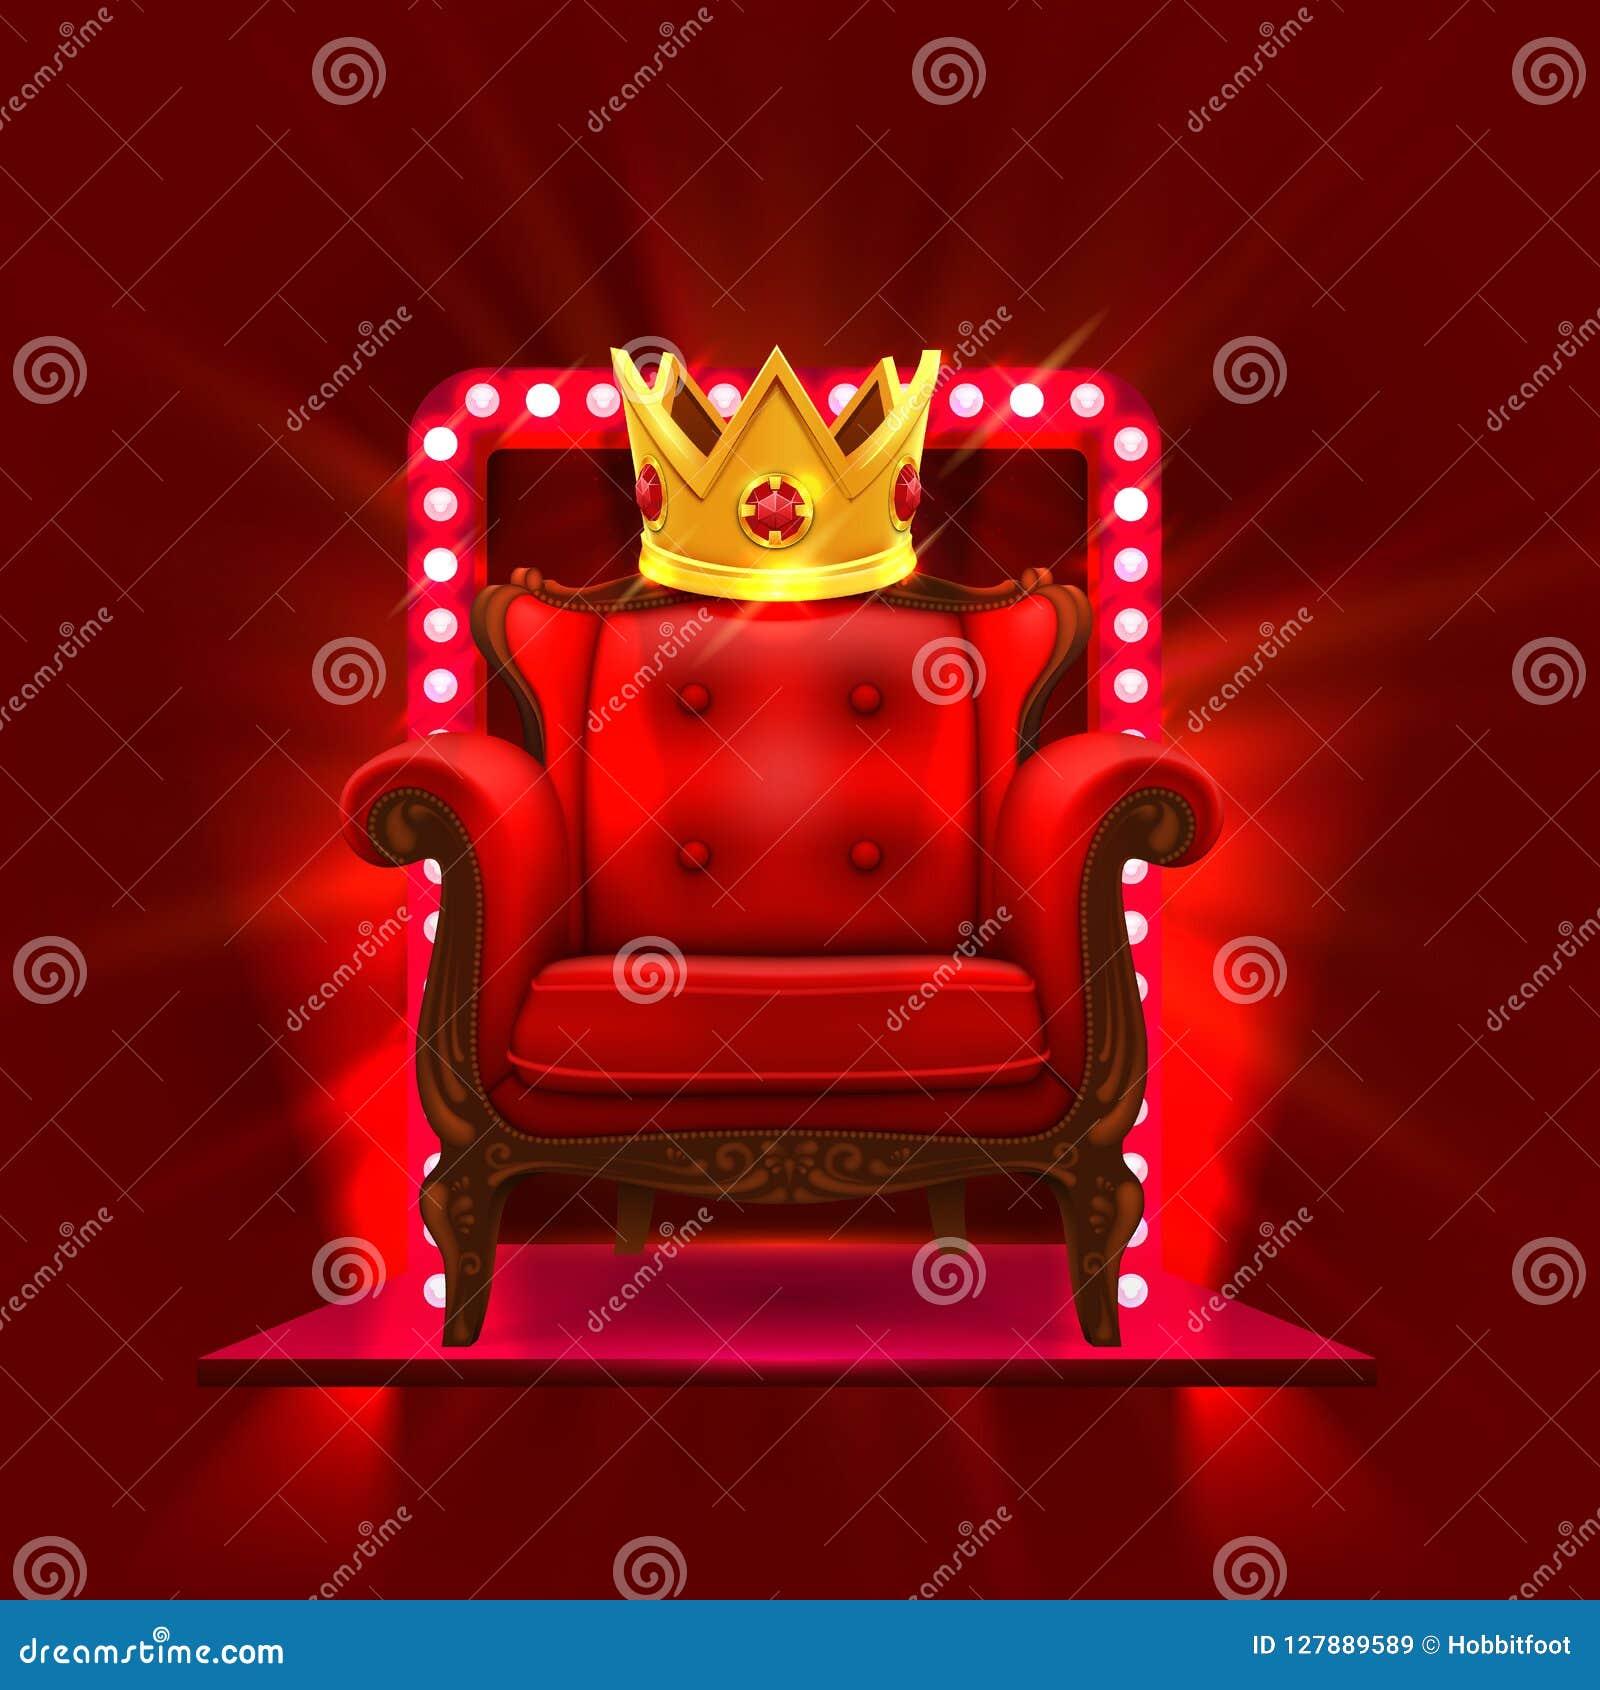 Chair King Casino Podium Stock Vector Illustration Of Celebration 127889589